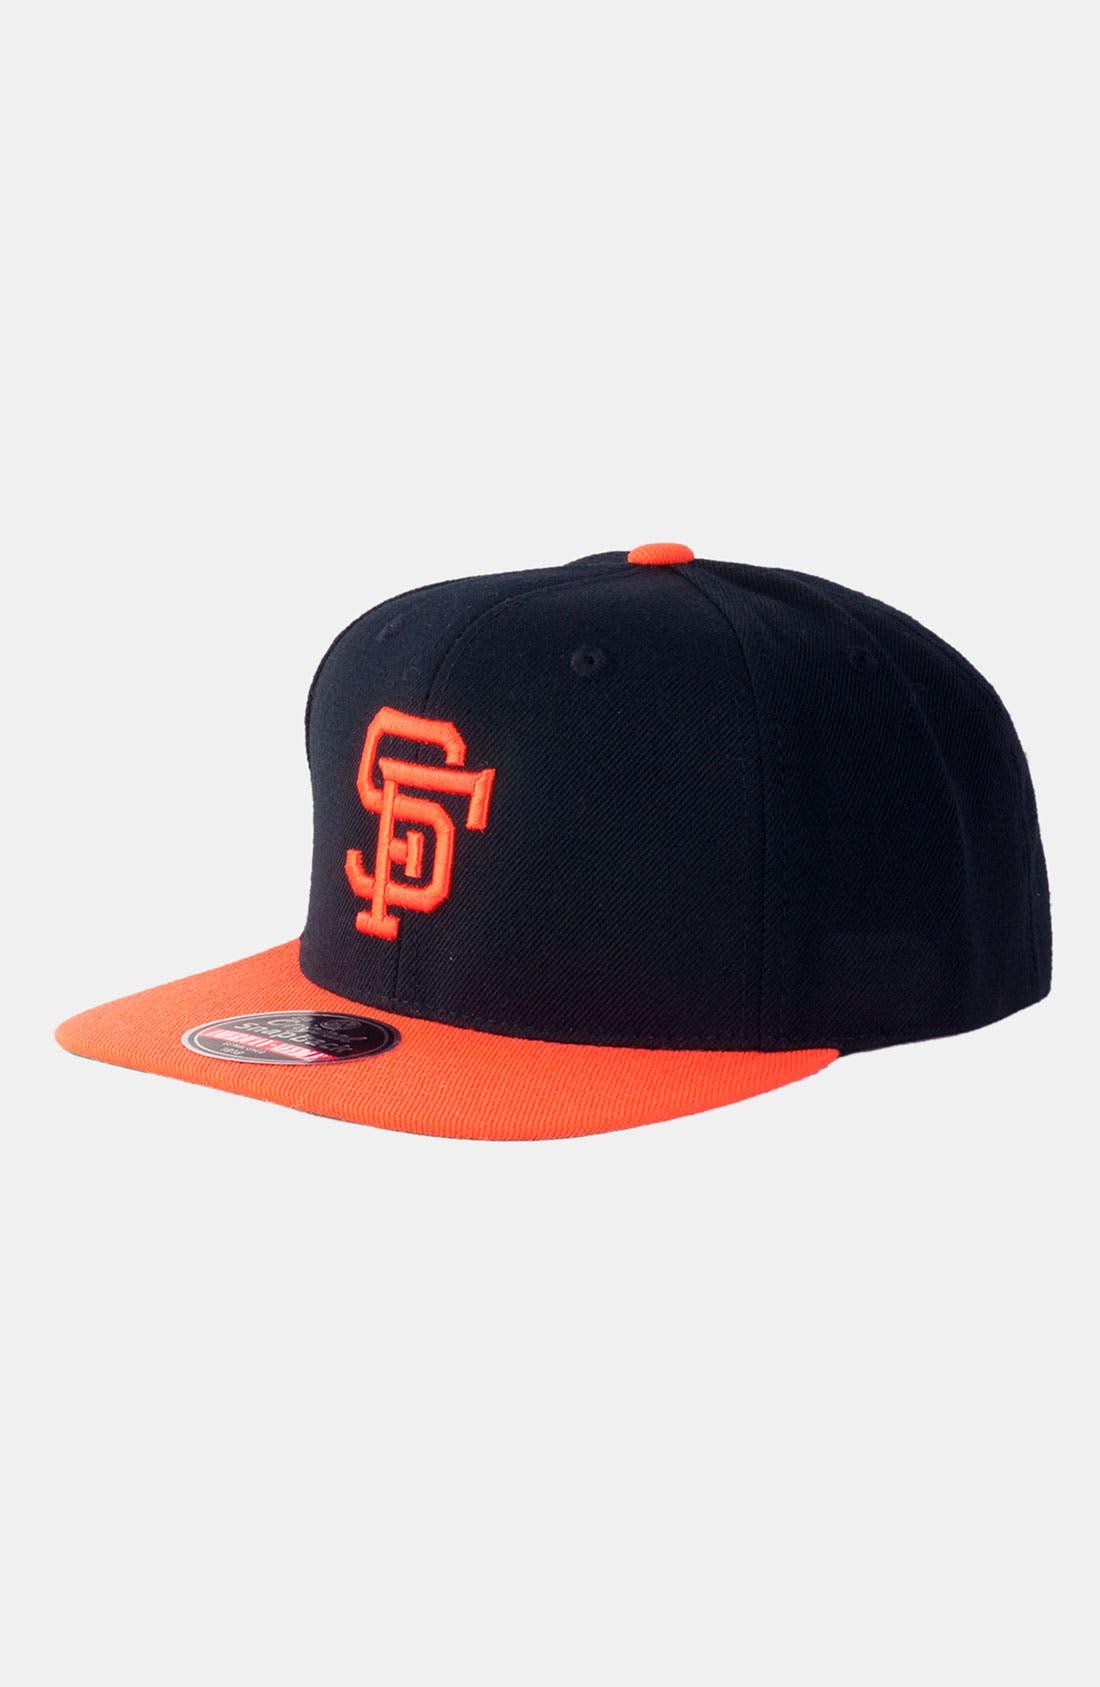 Main Image - American Needle 'San Francisco Giants - Cooperstown' Snapback Baseball Cap